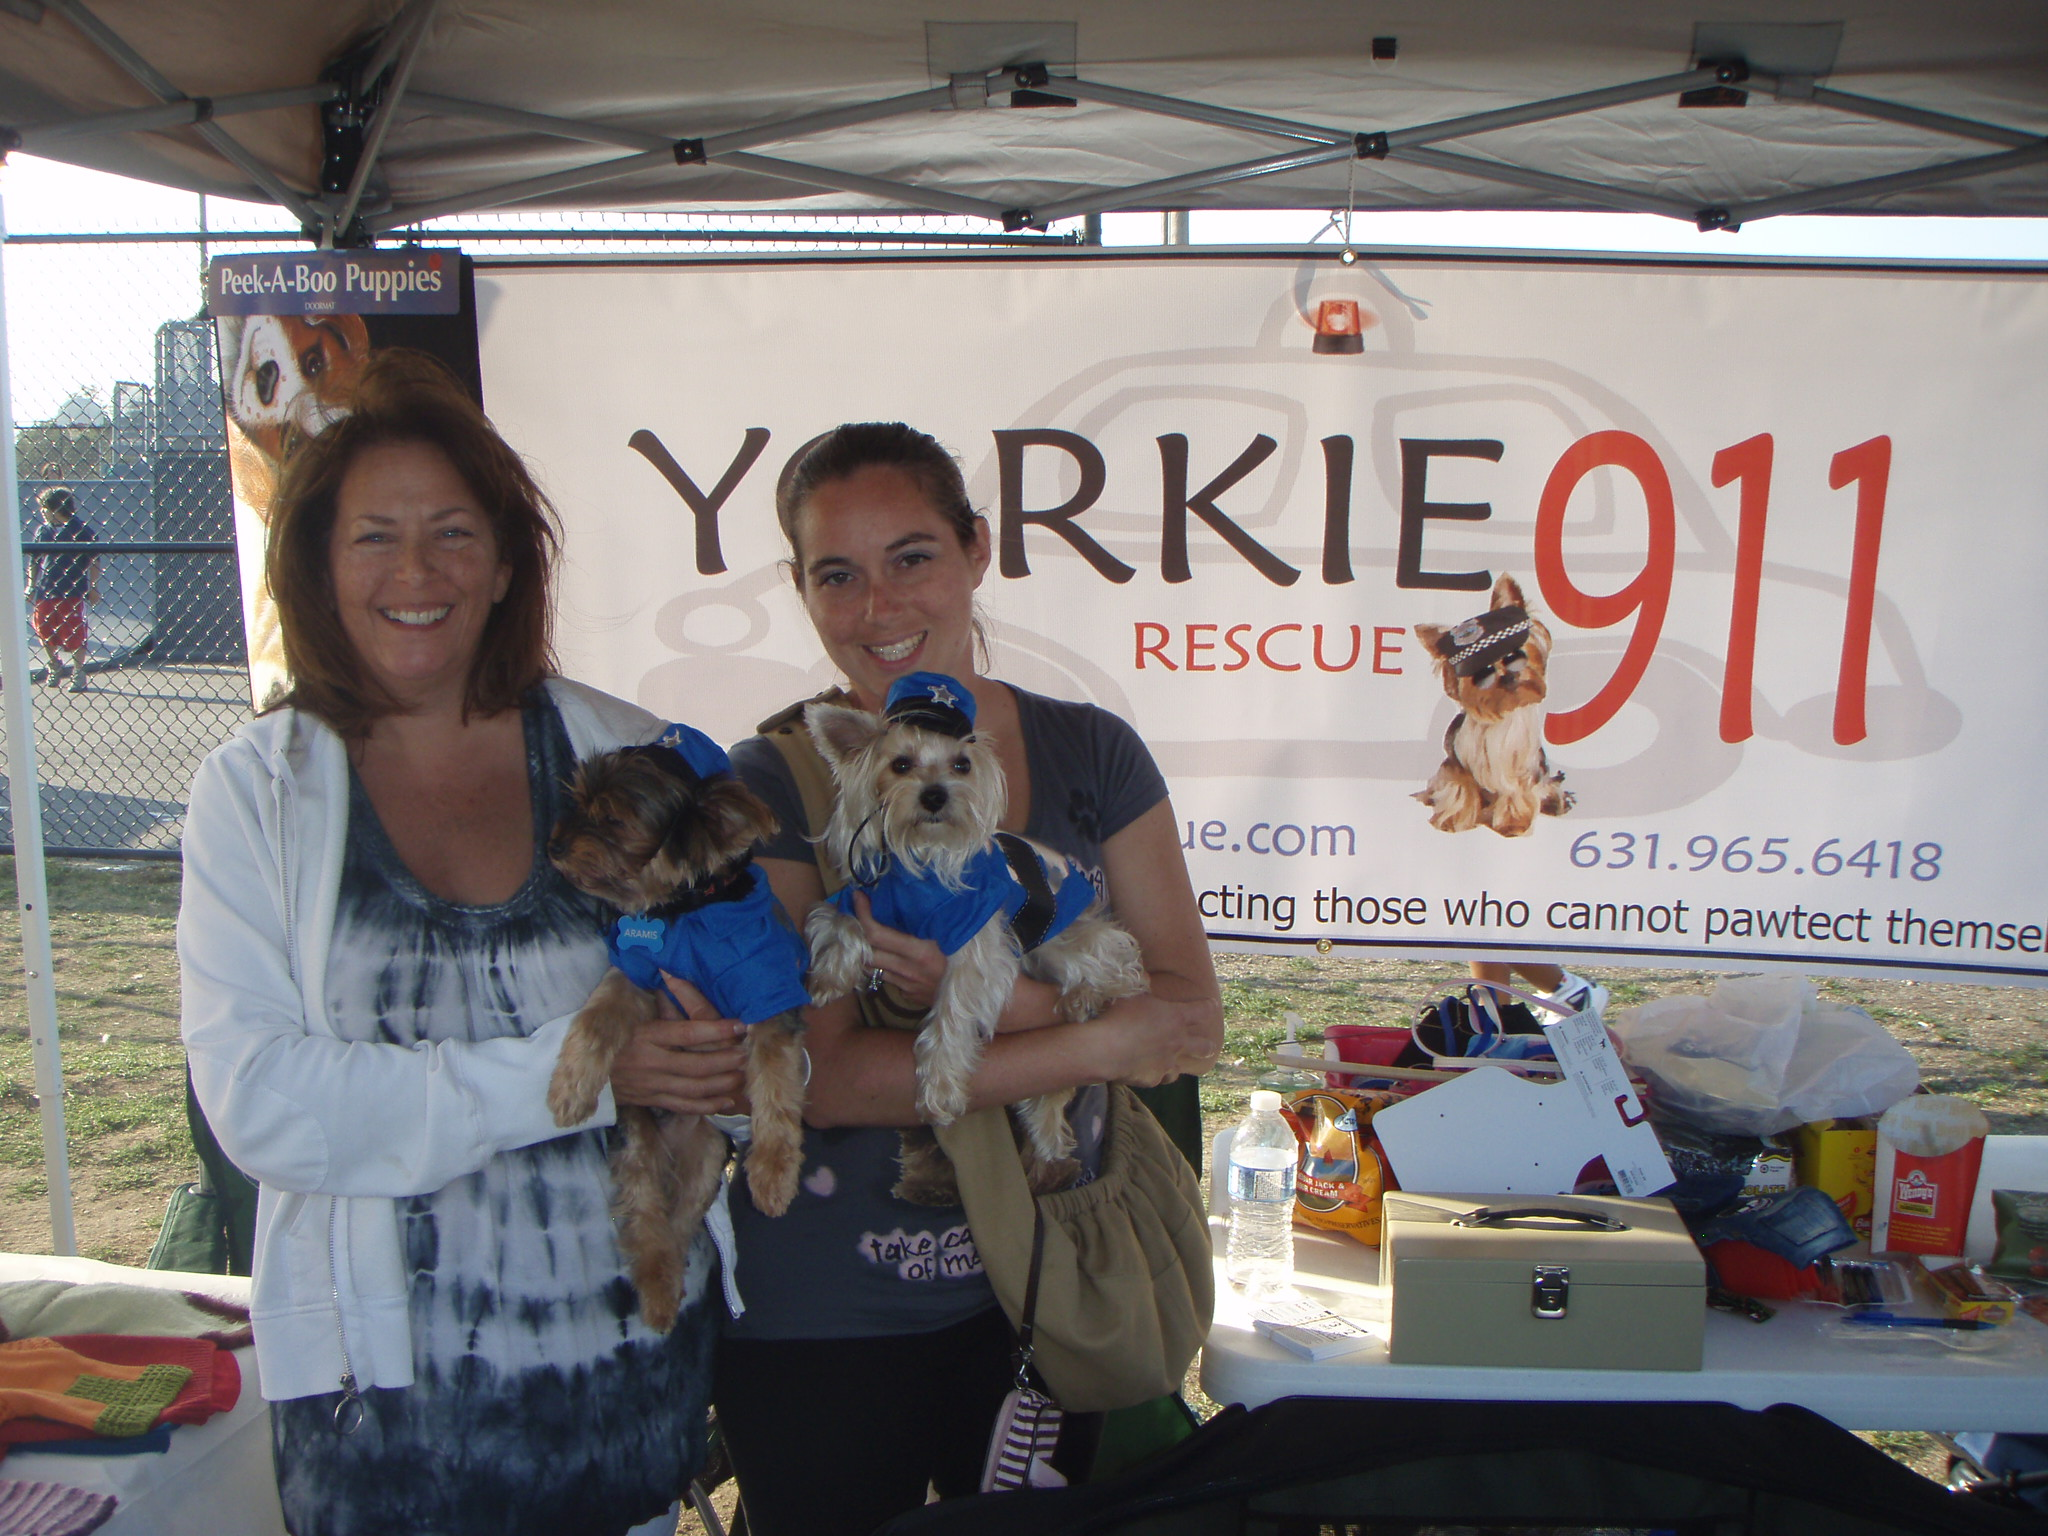 Yorkie911 Doggie Rescue Squad